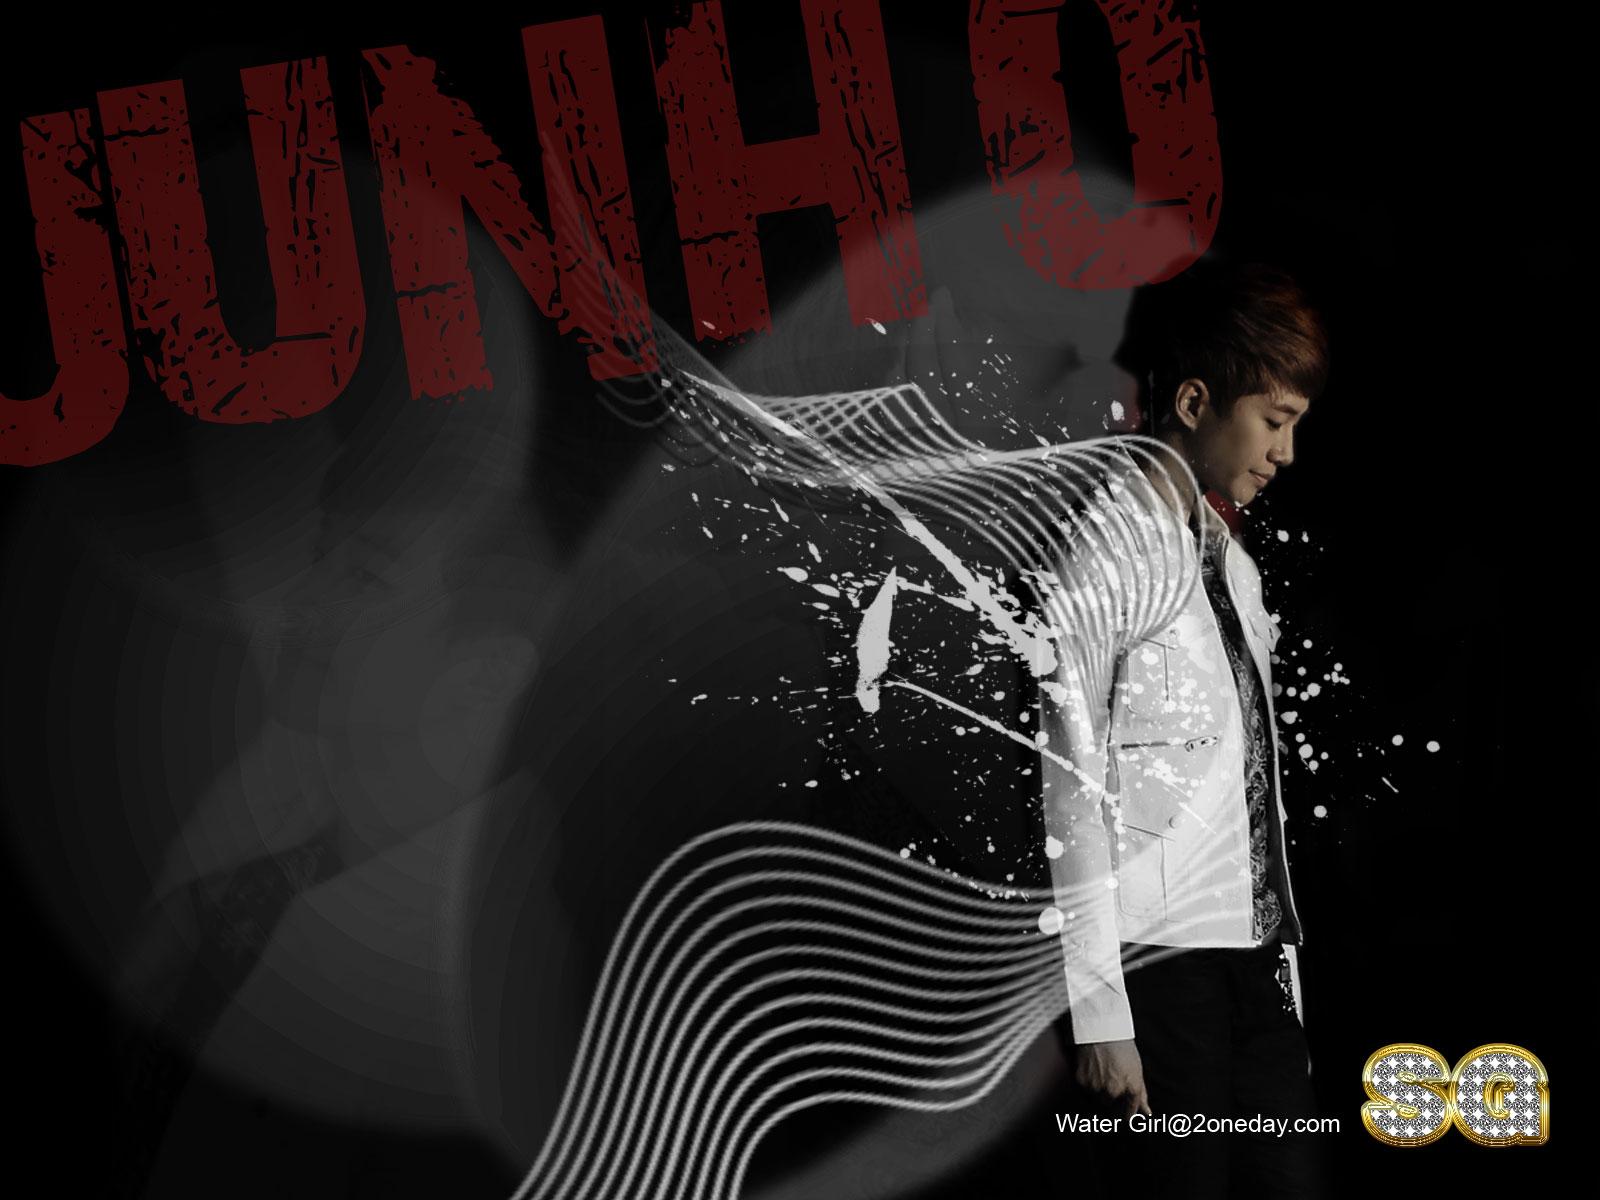 Junho  2pm Wallpaper 34554784  Fanpop